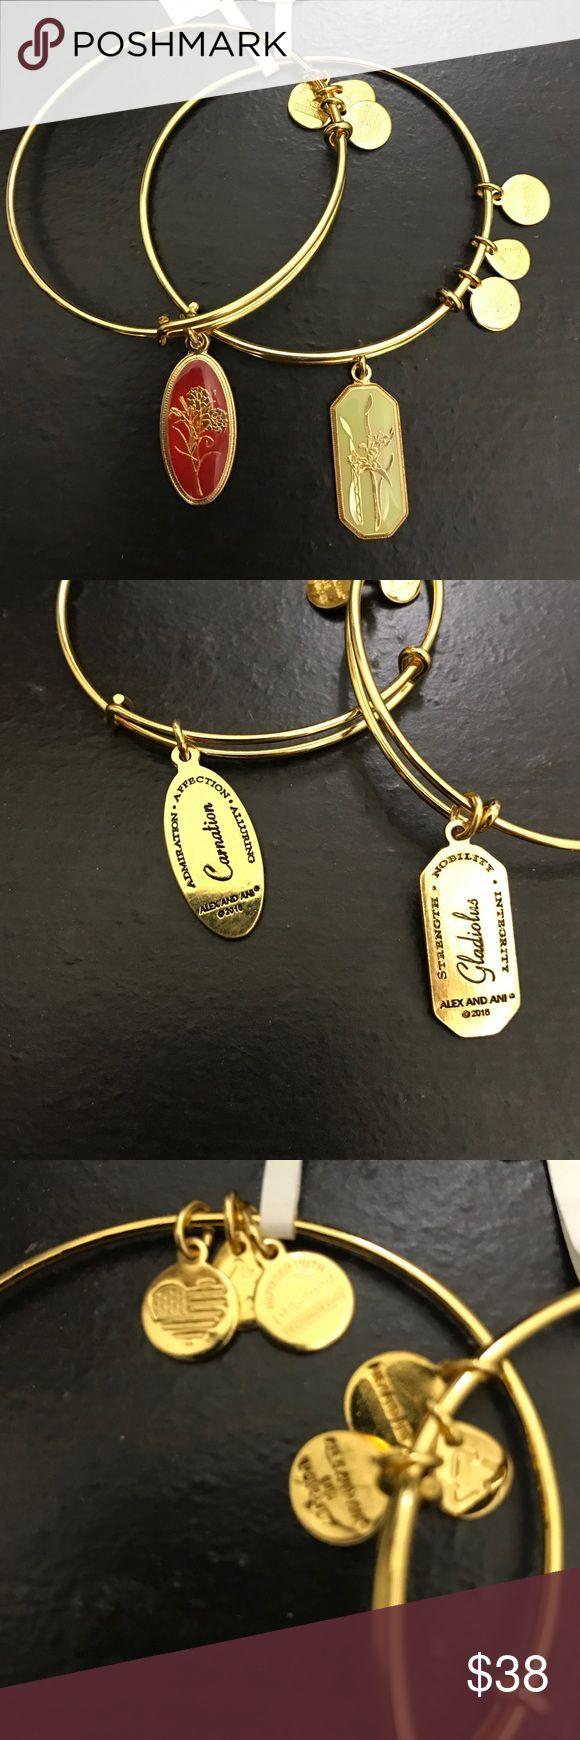 Alex and Ani set Alex and Ani set of two shiny bracelets both are new with retail tags Alex & Ani Jewelry Bracelets